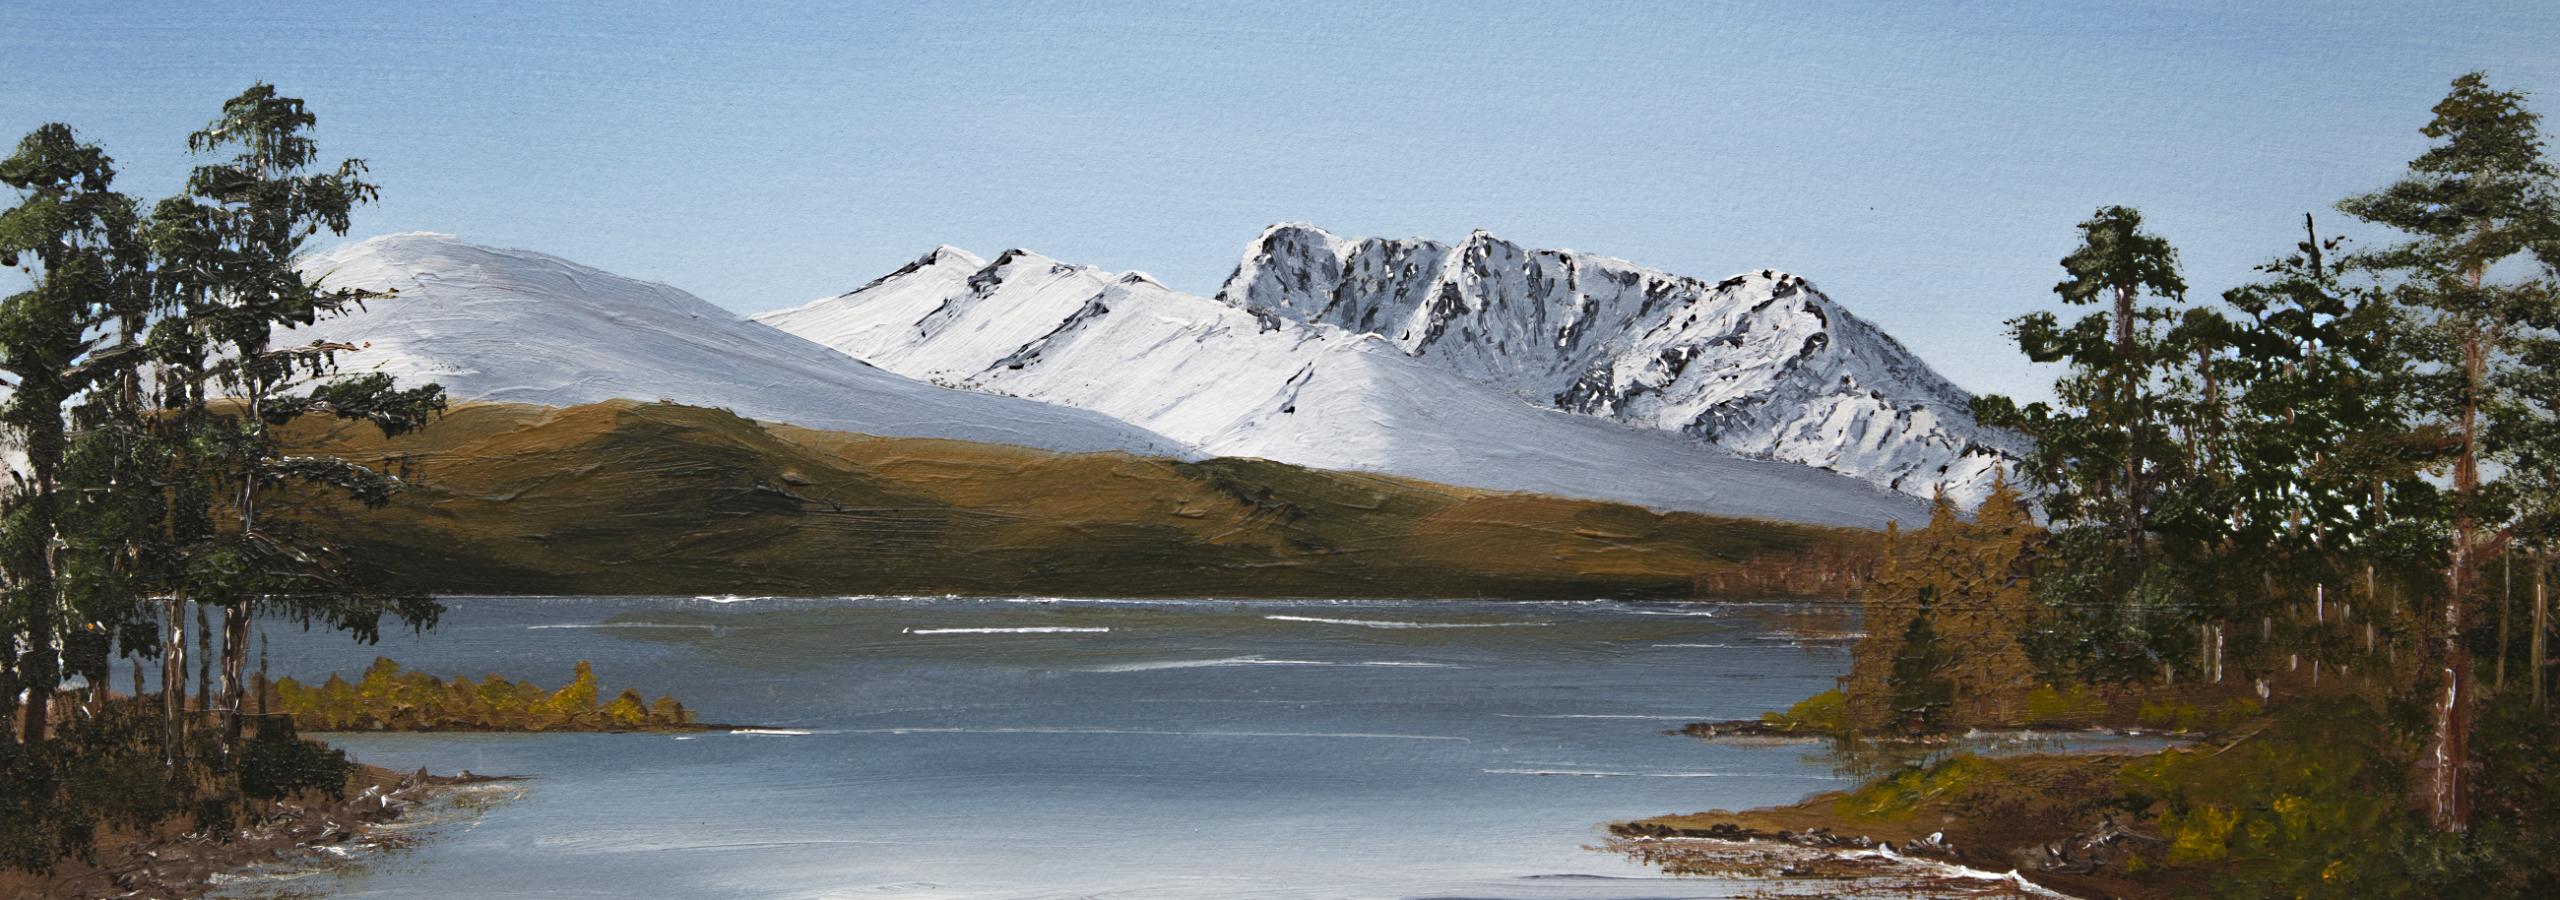 Ben Nevis from Bunarkaig across Loch Lochy Oil painting